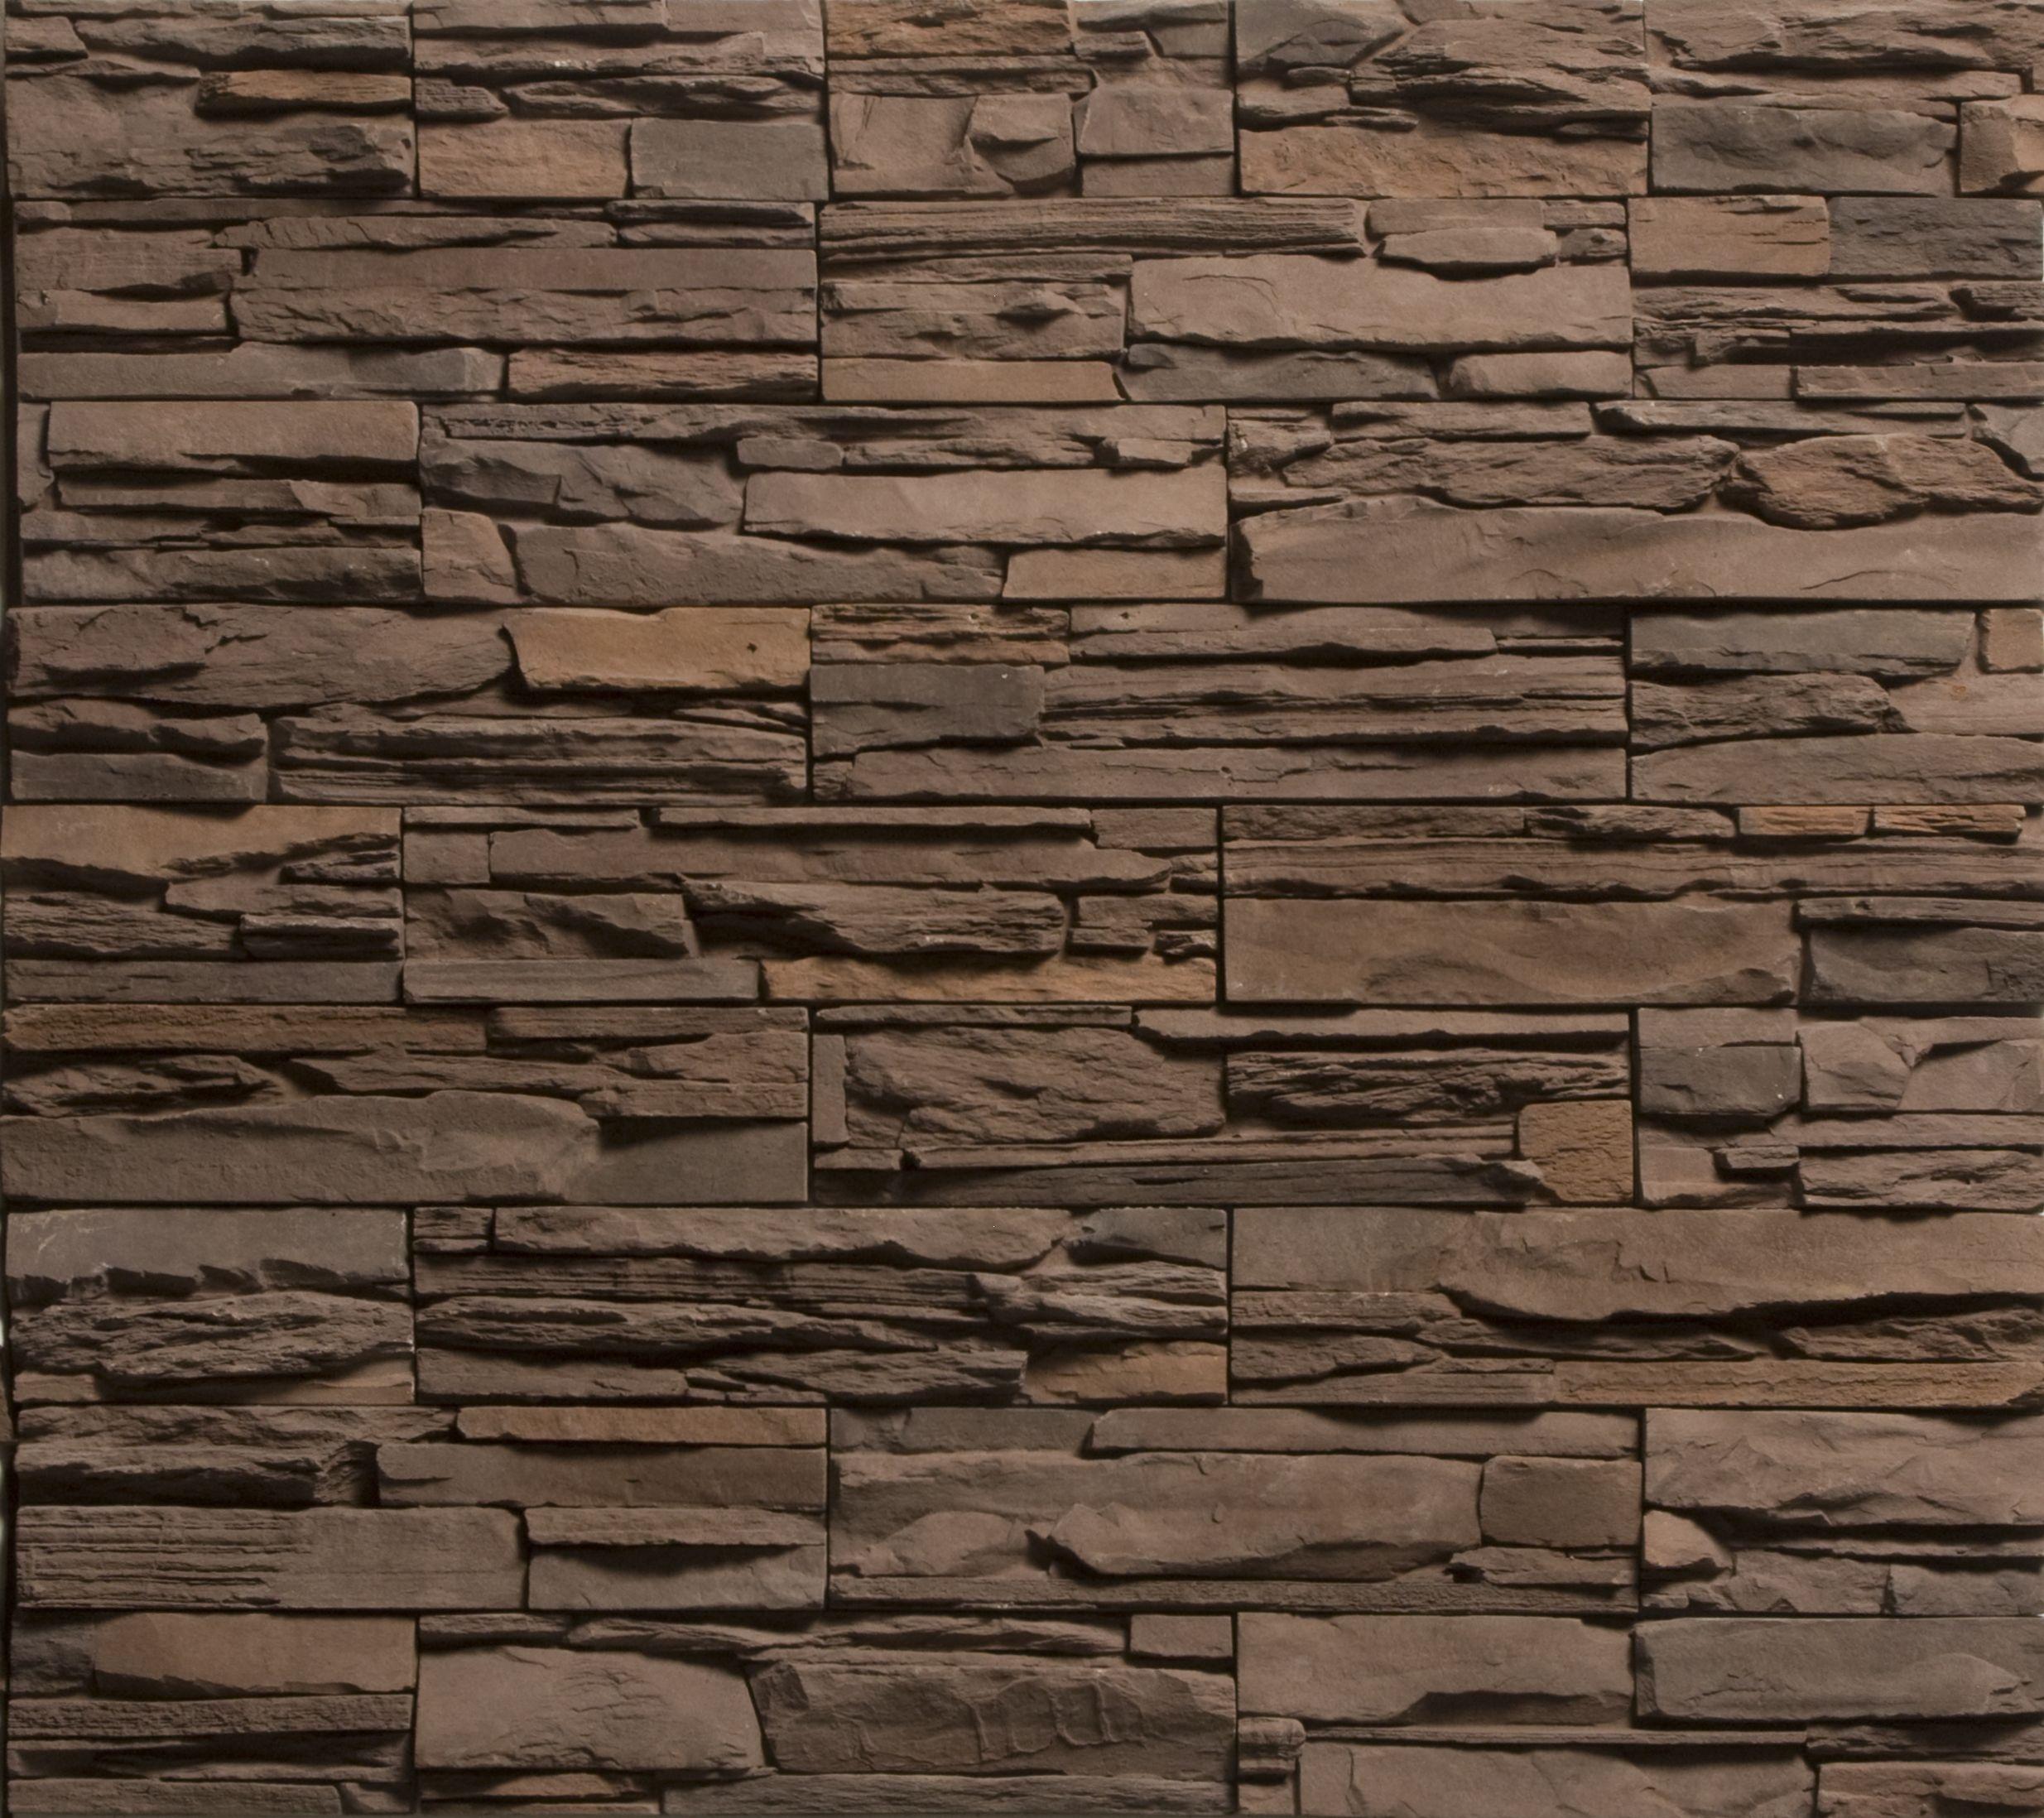 stone texture | texture: коричневый stone, wall, texture stone ...